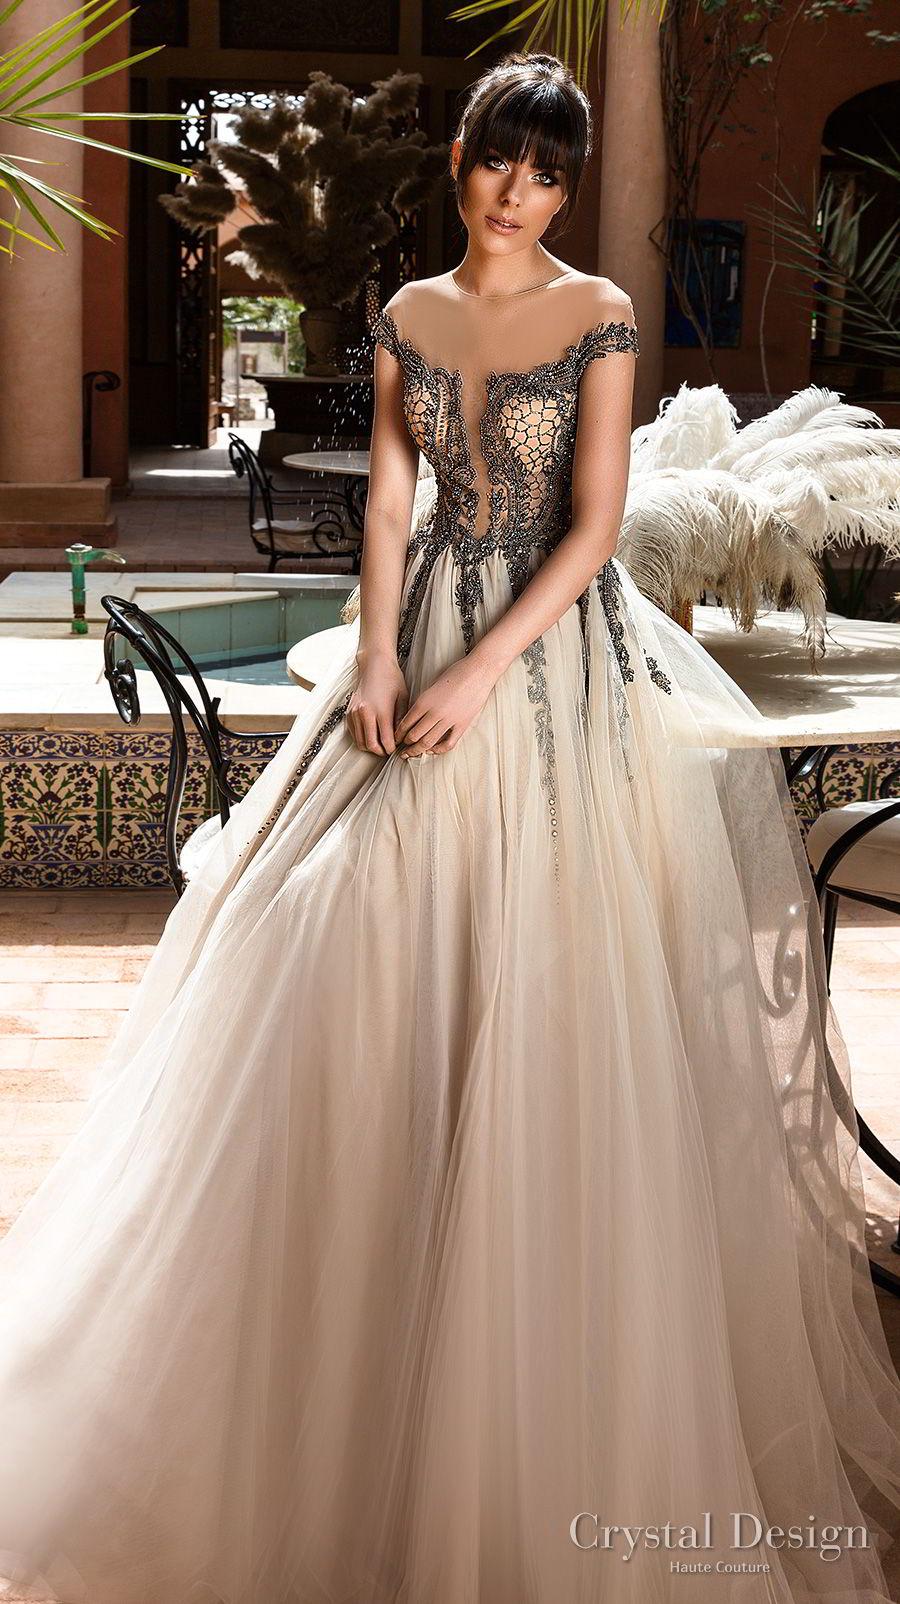 crystal design 2018 cap sleeves sheer jewel sweetheart neck black lace tulle skirt romantic a line wedding dress lace back medium train (summery) mv